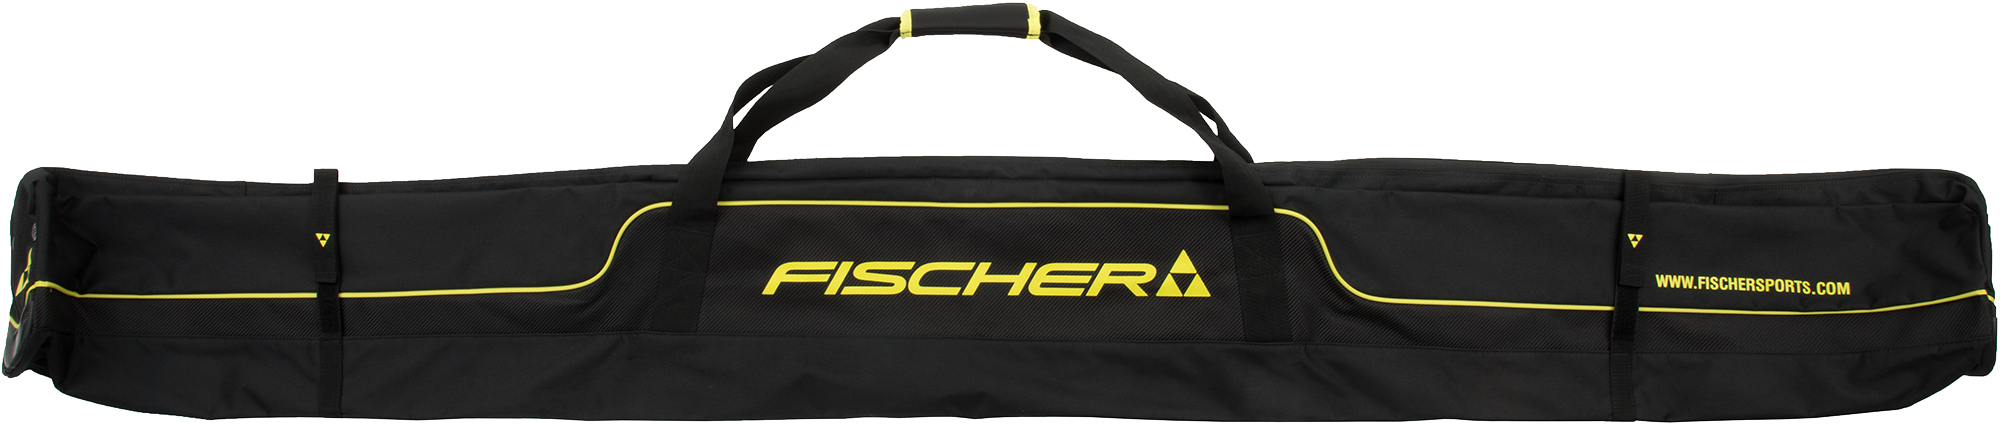 Fischer Чехол Fischer XC PERFORMANCE для беговых лыж 210 см, 1 пара цены онлайн